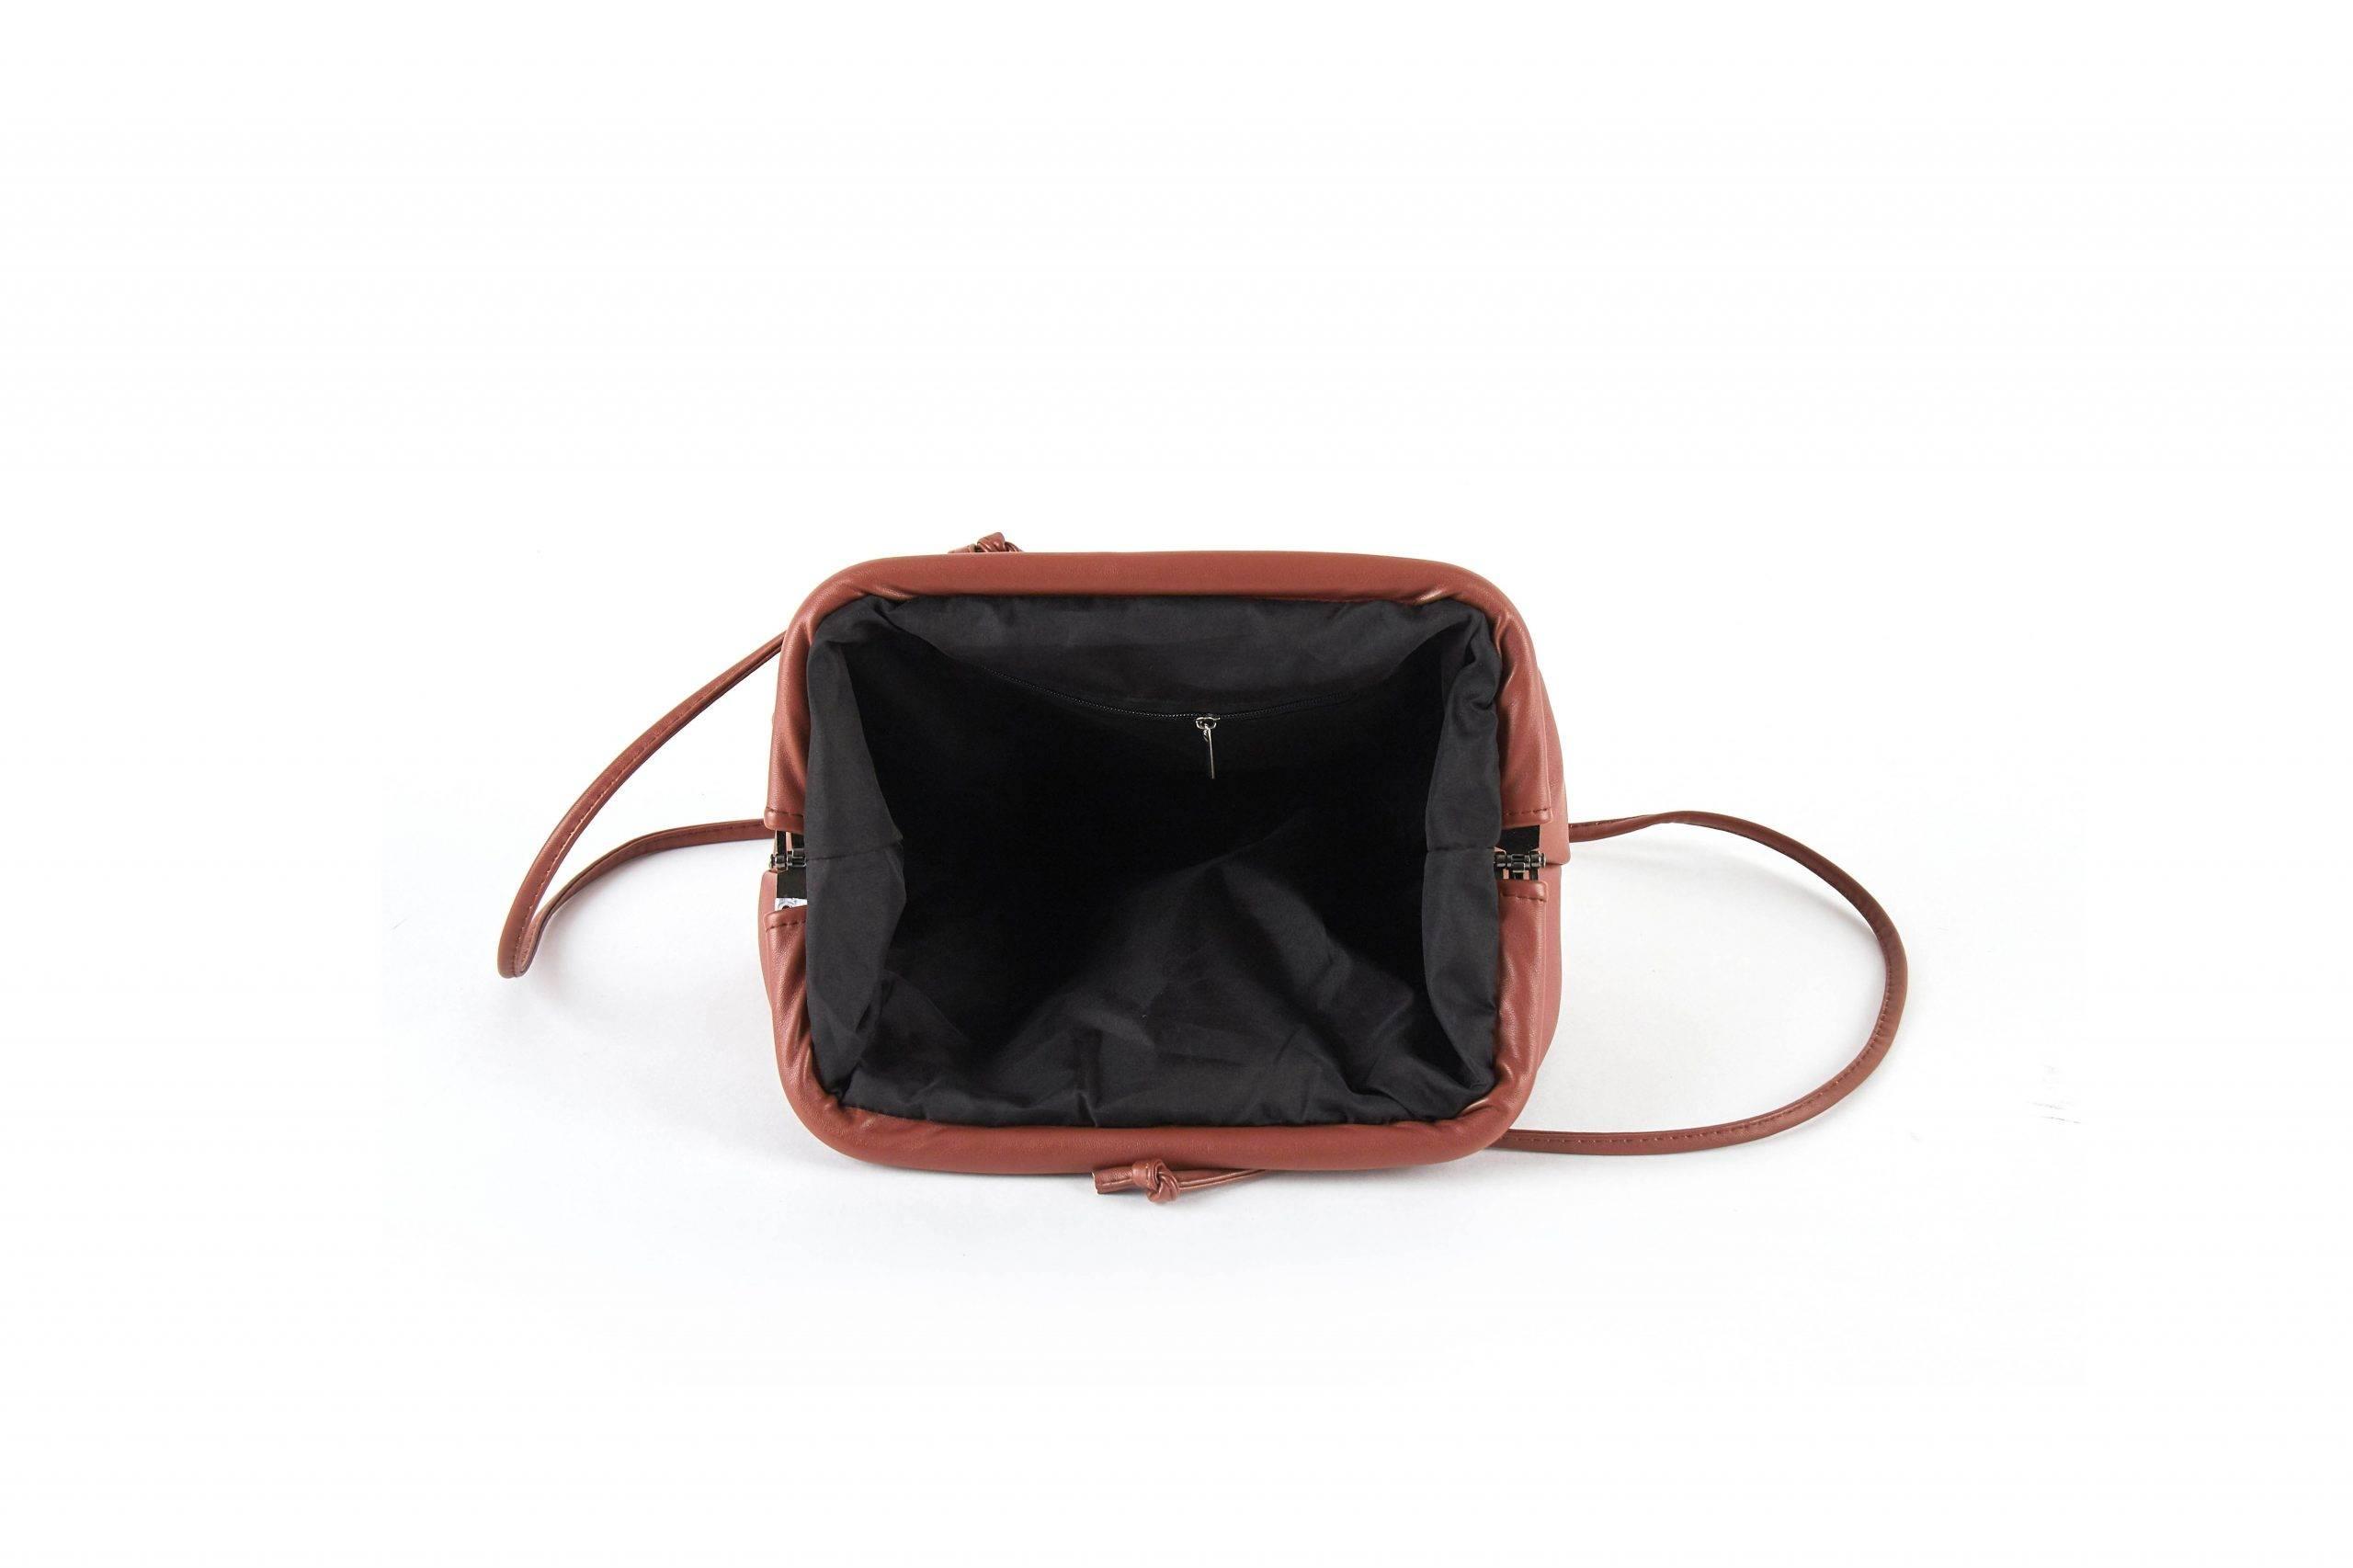 Women's Soft Cloud Shaped Shoulder Bag